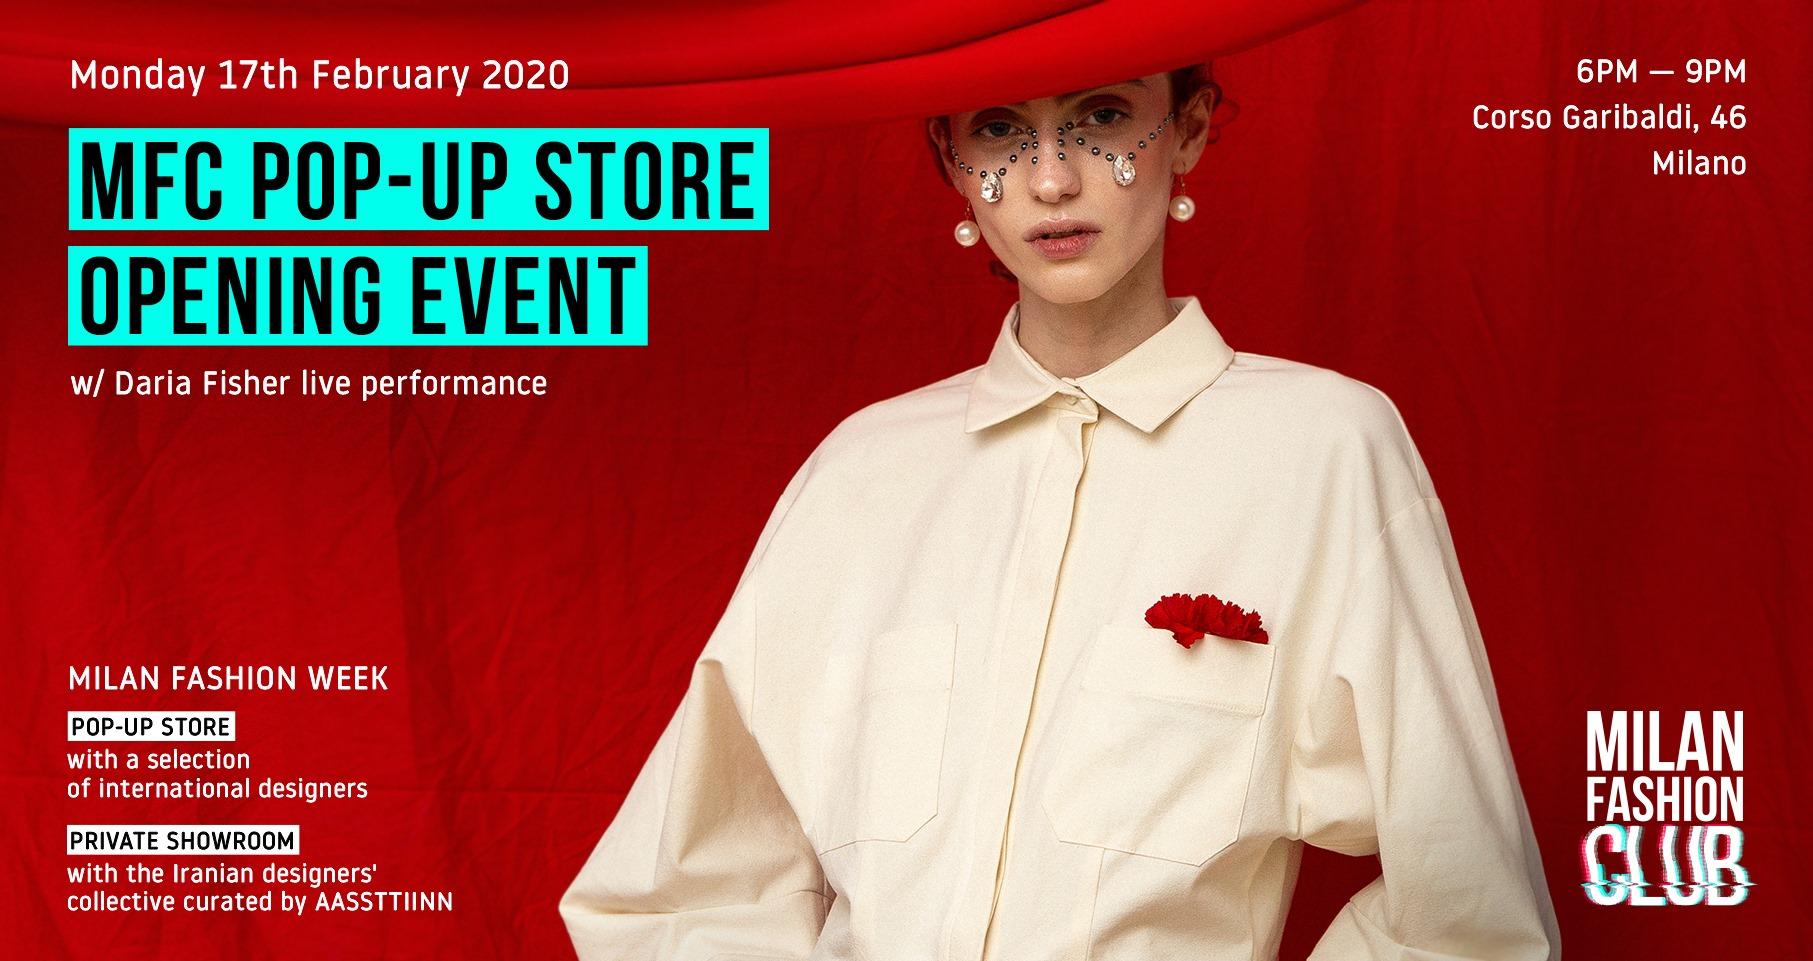 MFC Pop-Up Store OUparti corso garibaldi milano fashion week